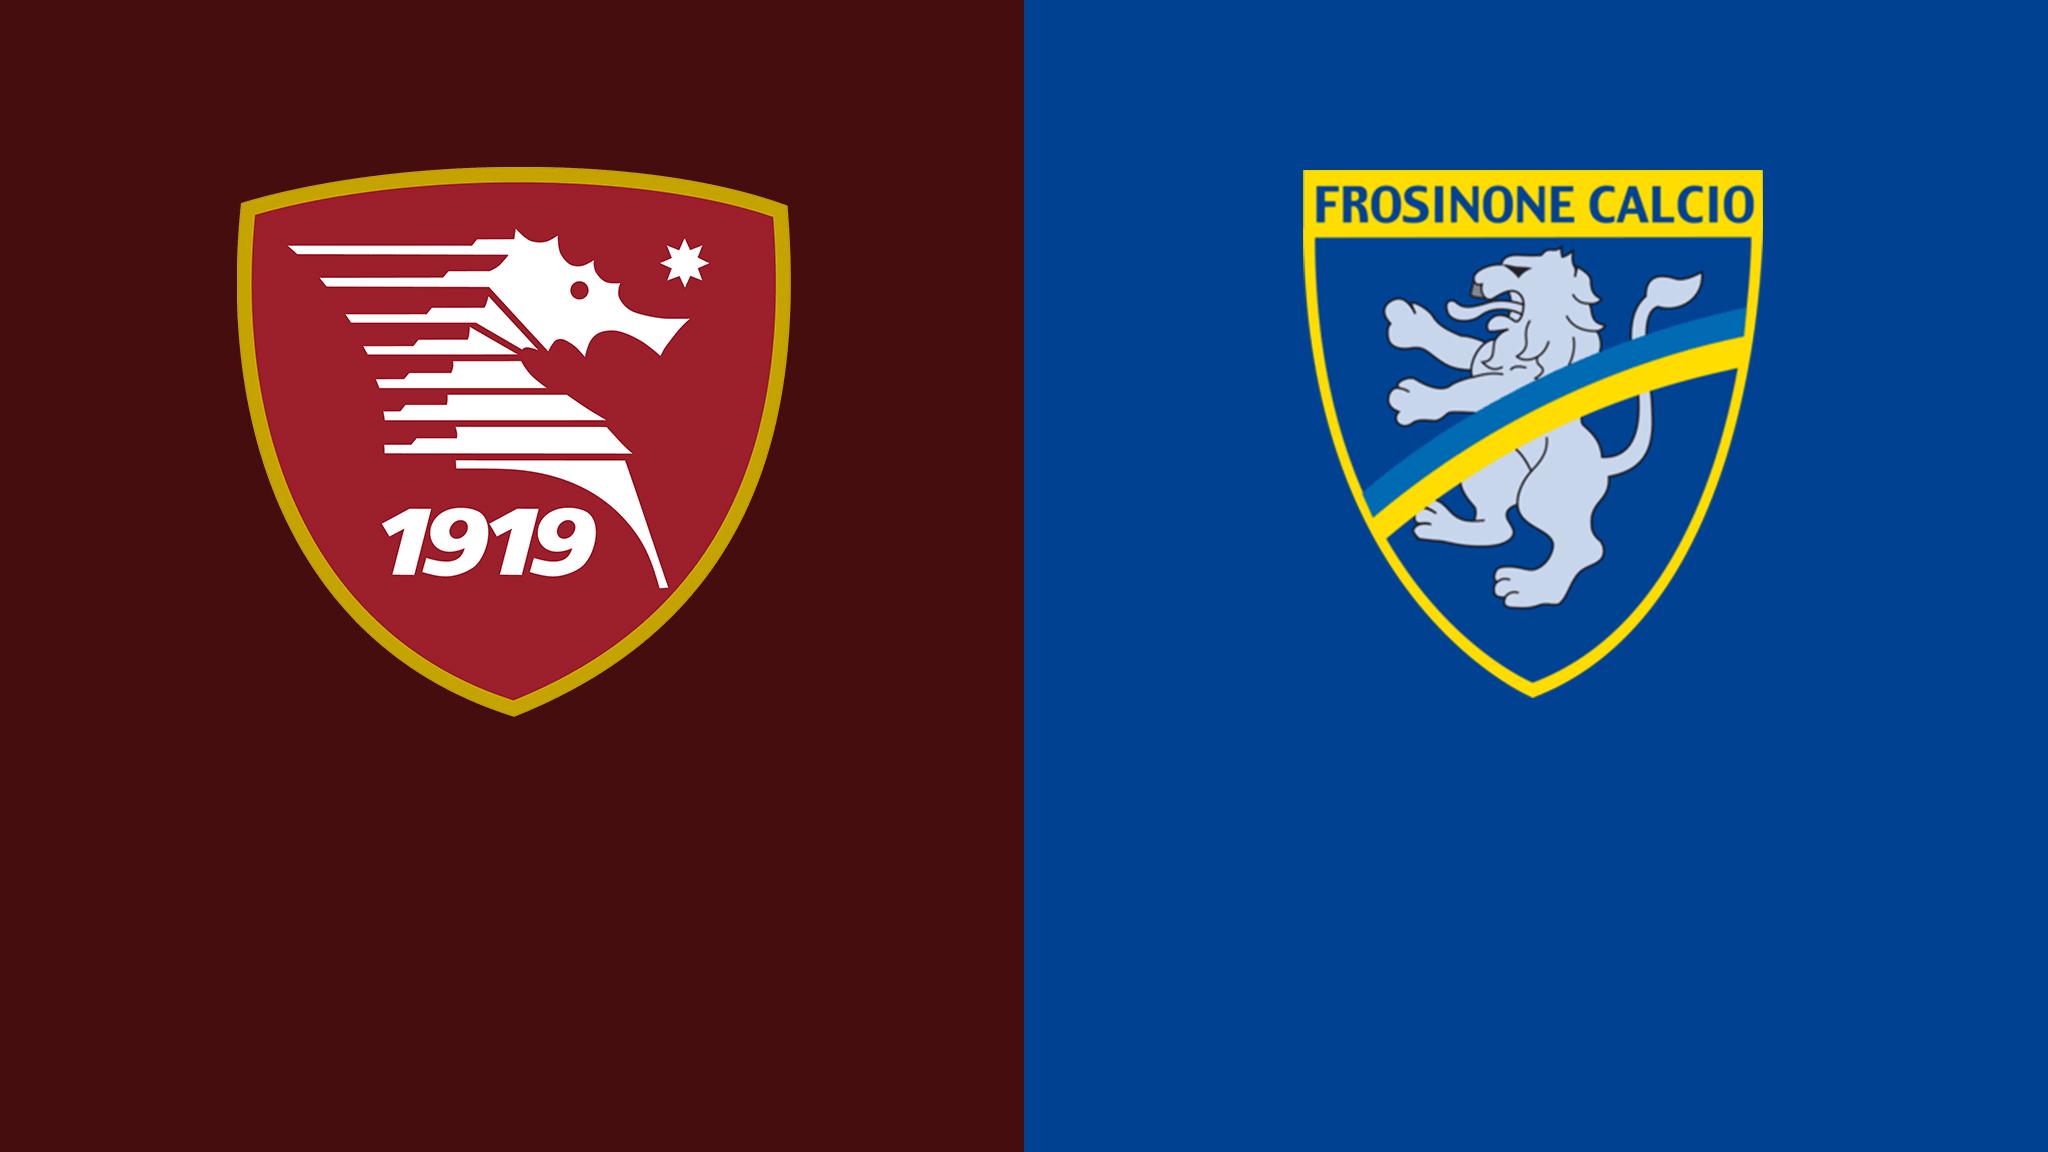 Salernitana - Frosinone in Diretta Streaming | Abbonati a 9,99€/mese